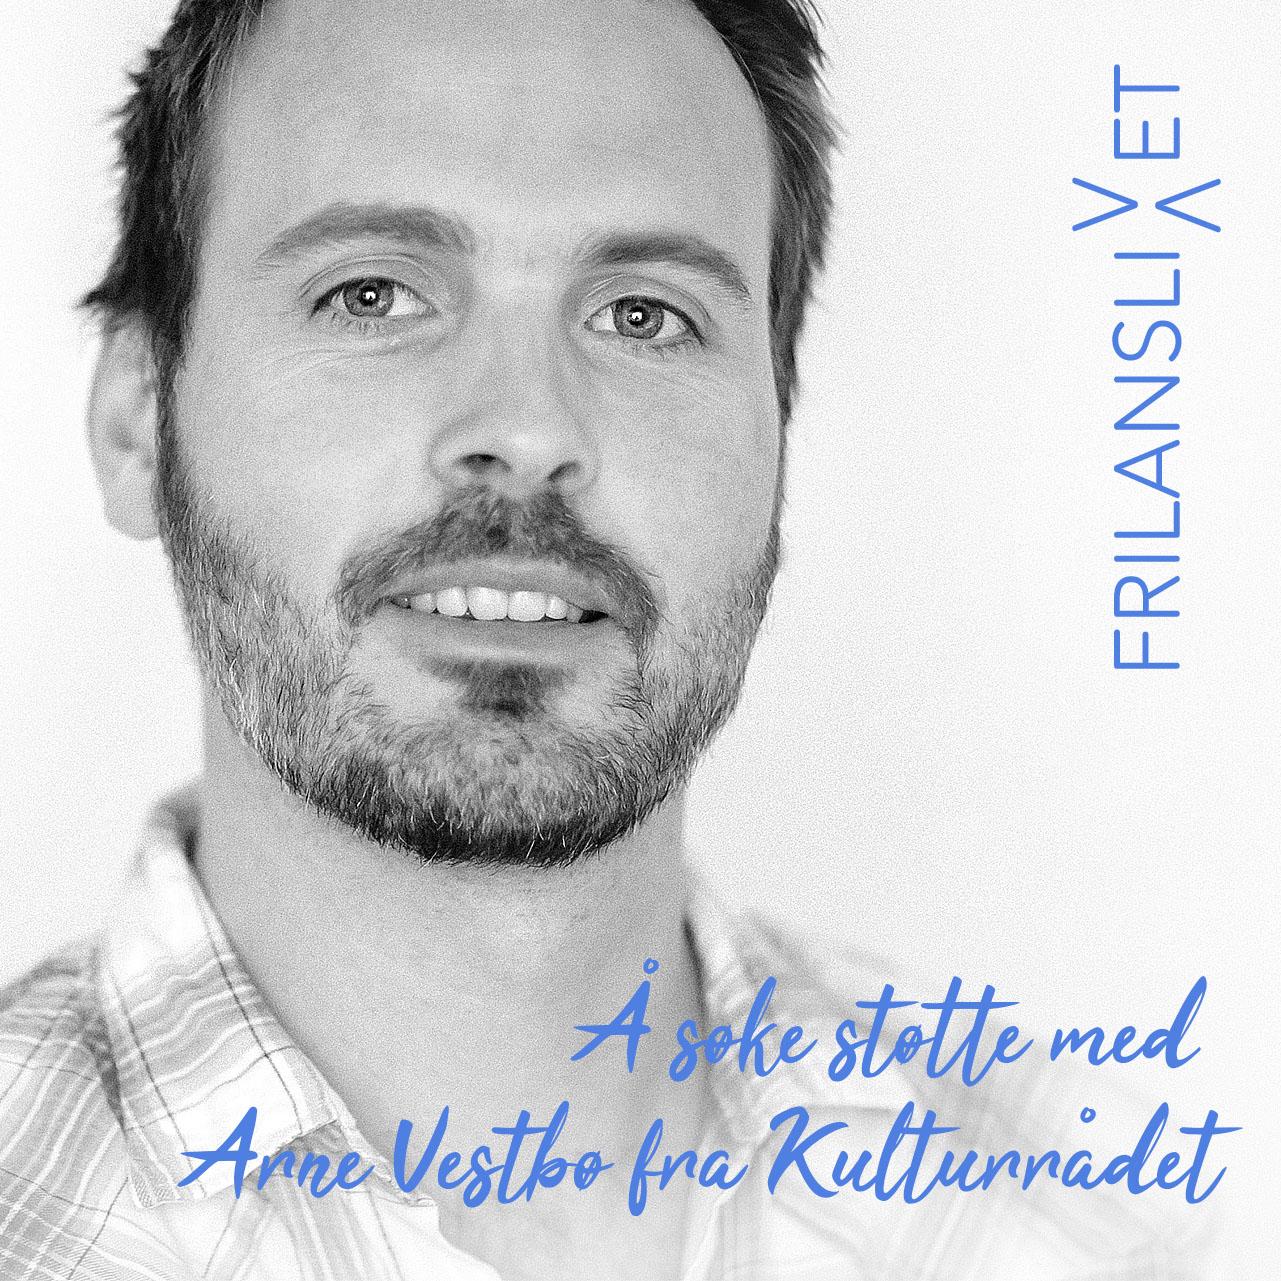 Foto: Ilja Hendel/Kulturrådet.